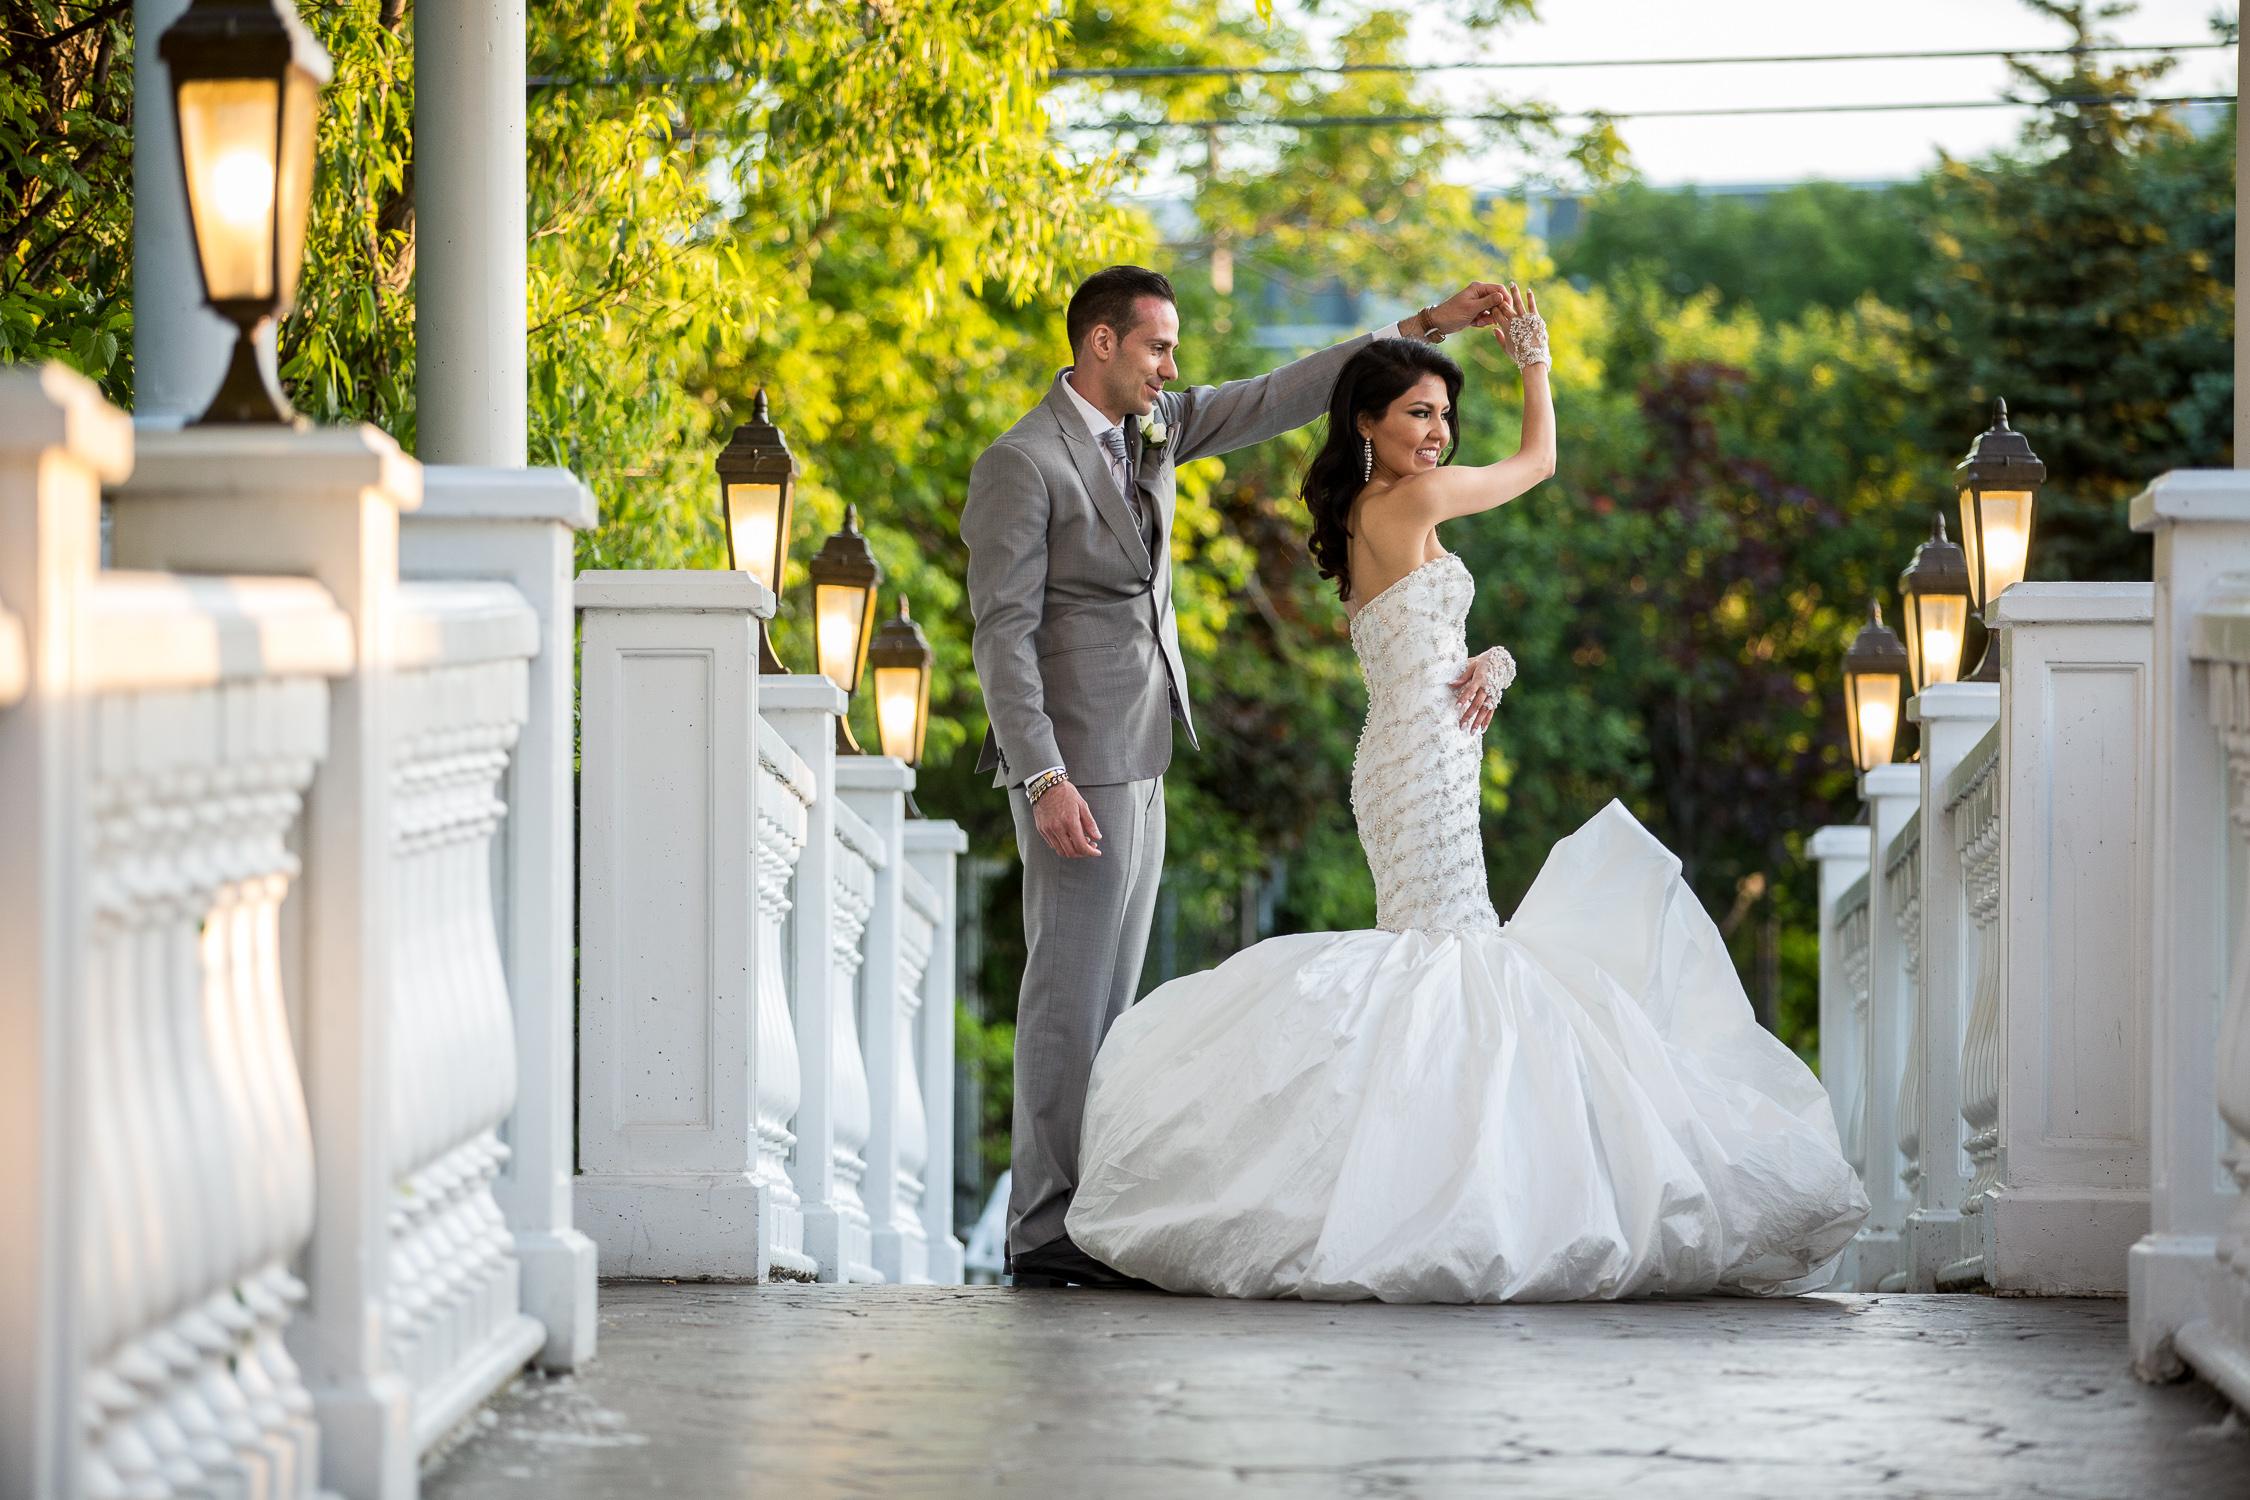 Paradise-Banquet-Hall-Wedding-Vaughan-Ontario-0081.jpg